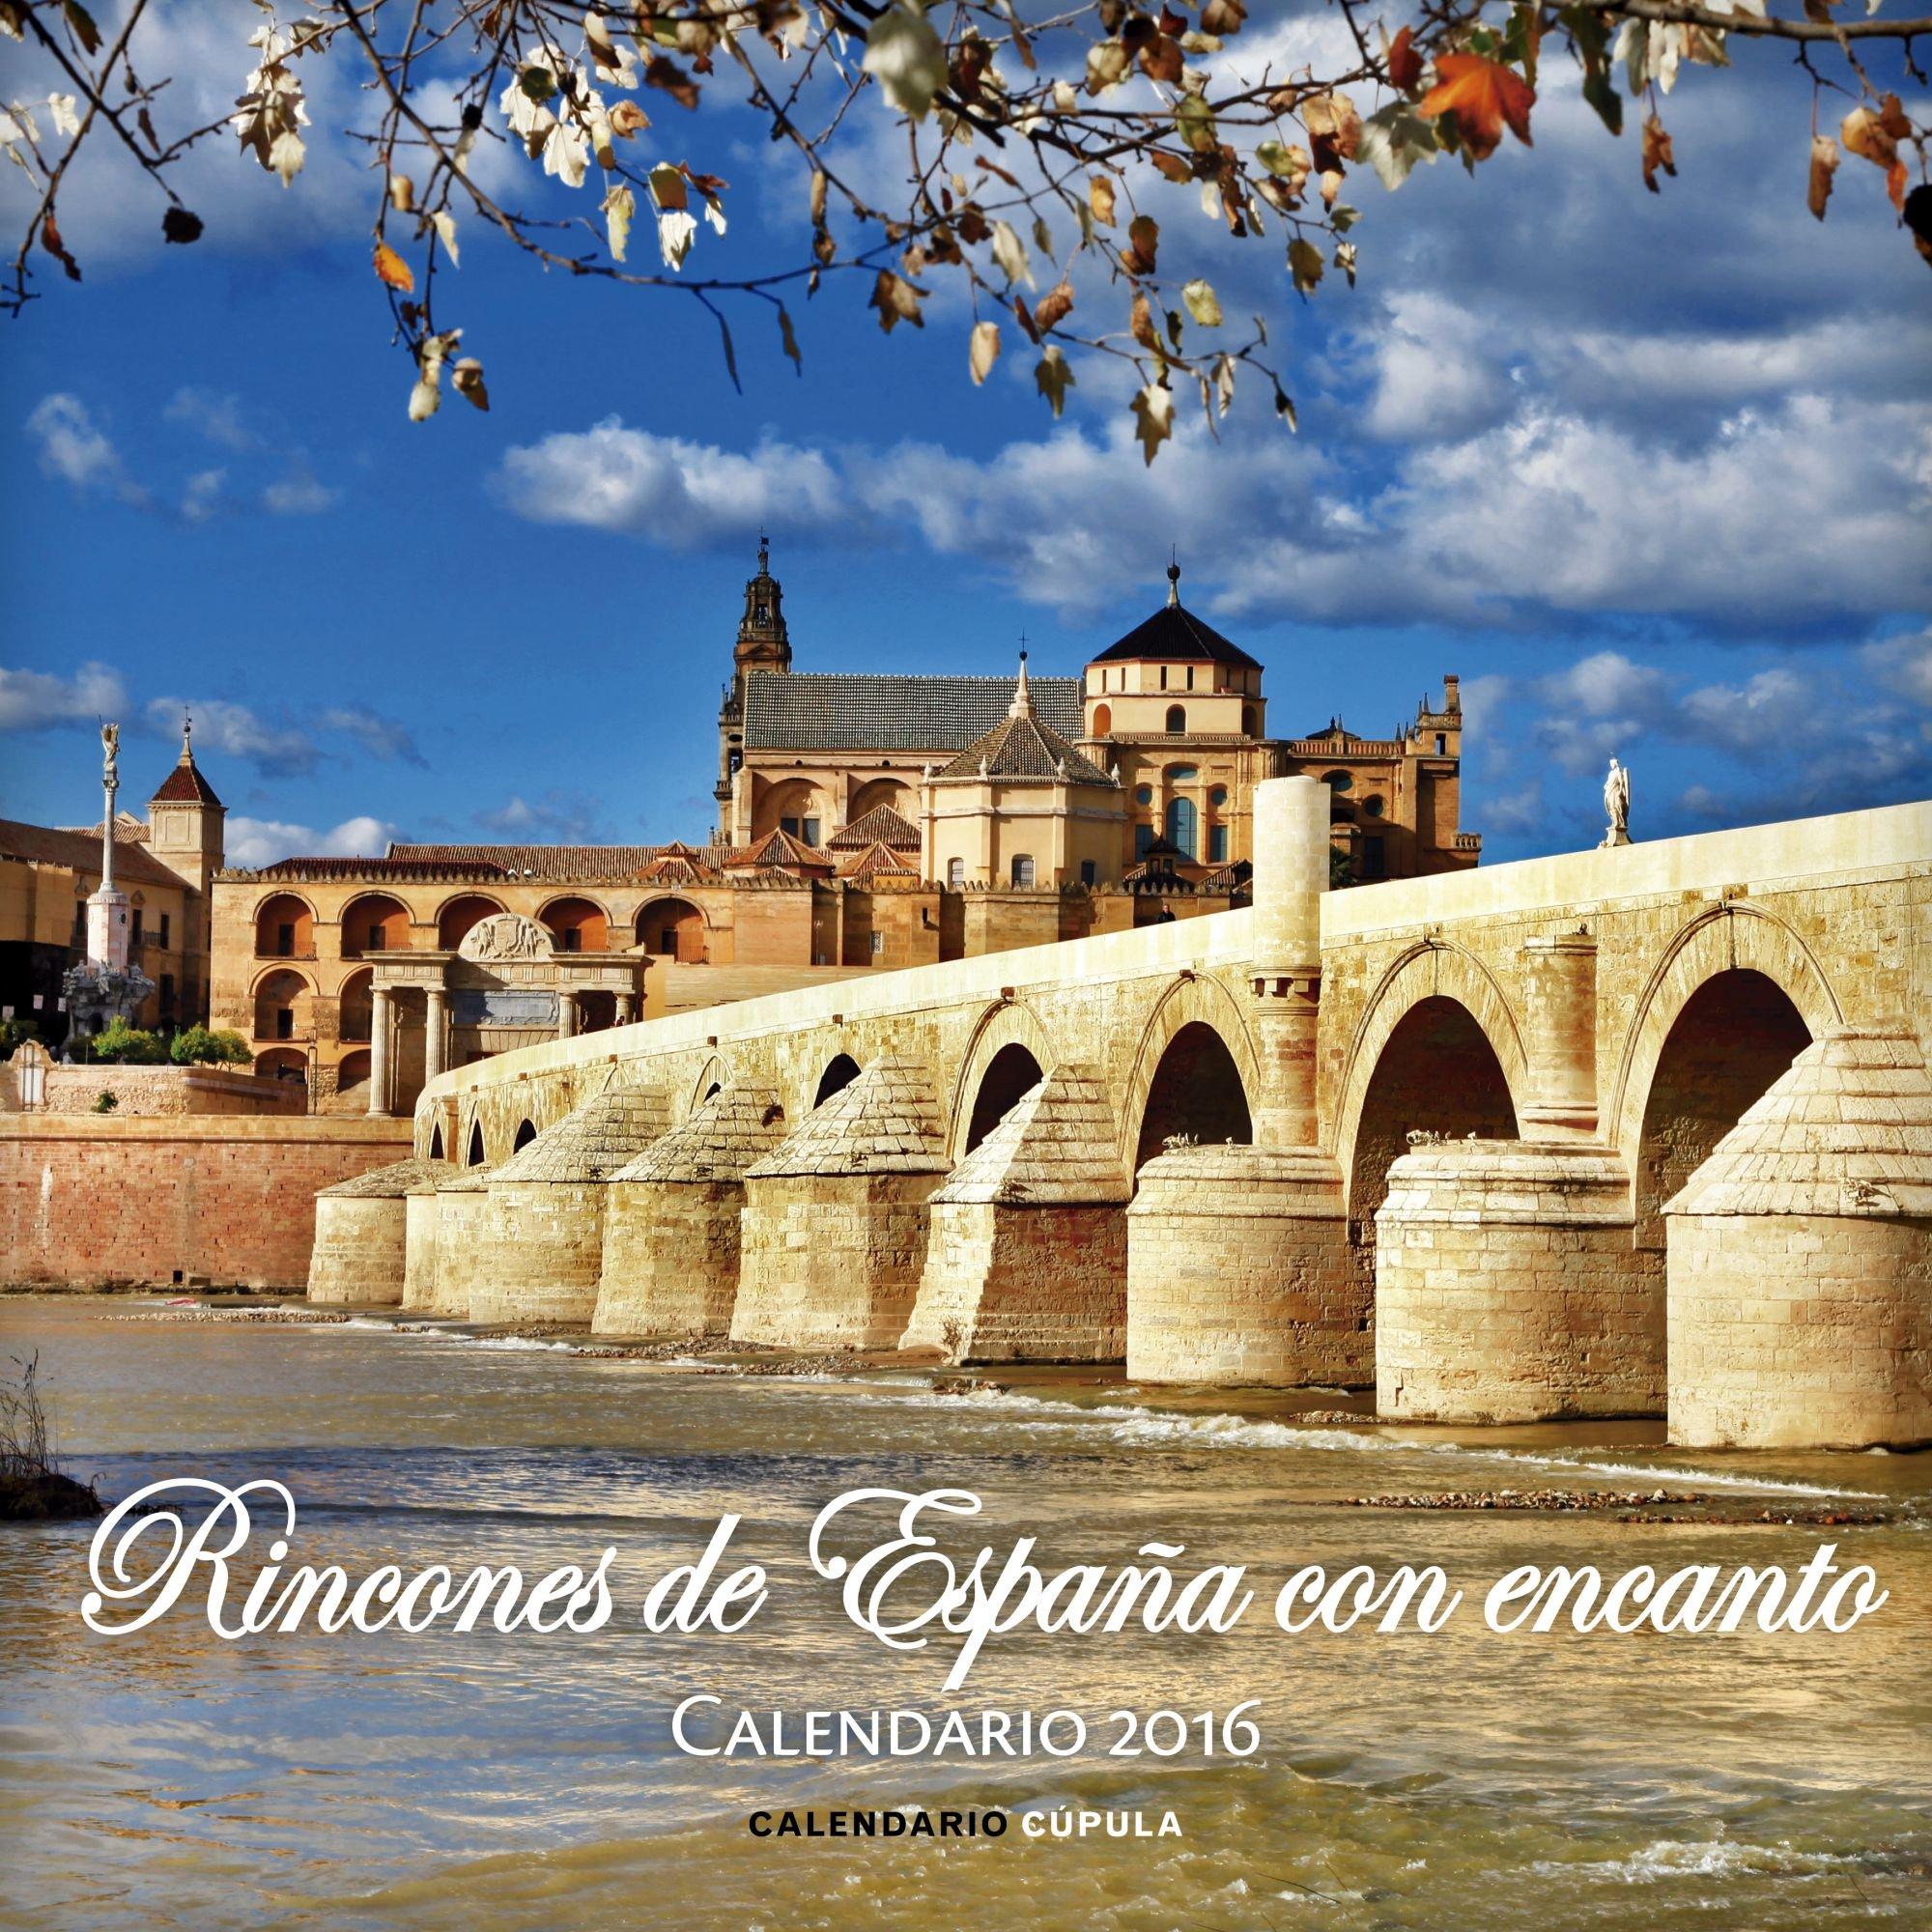 Calendario Rincones de España con encanto 2016 Calendarios y agendas: Amazon.es: AA. VV.: Libros